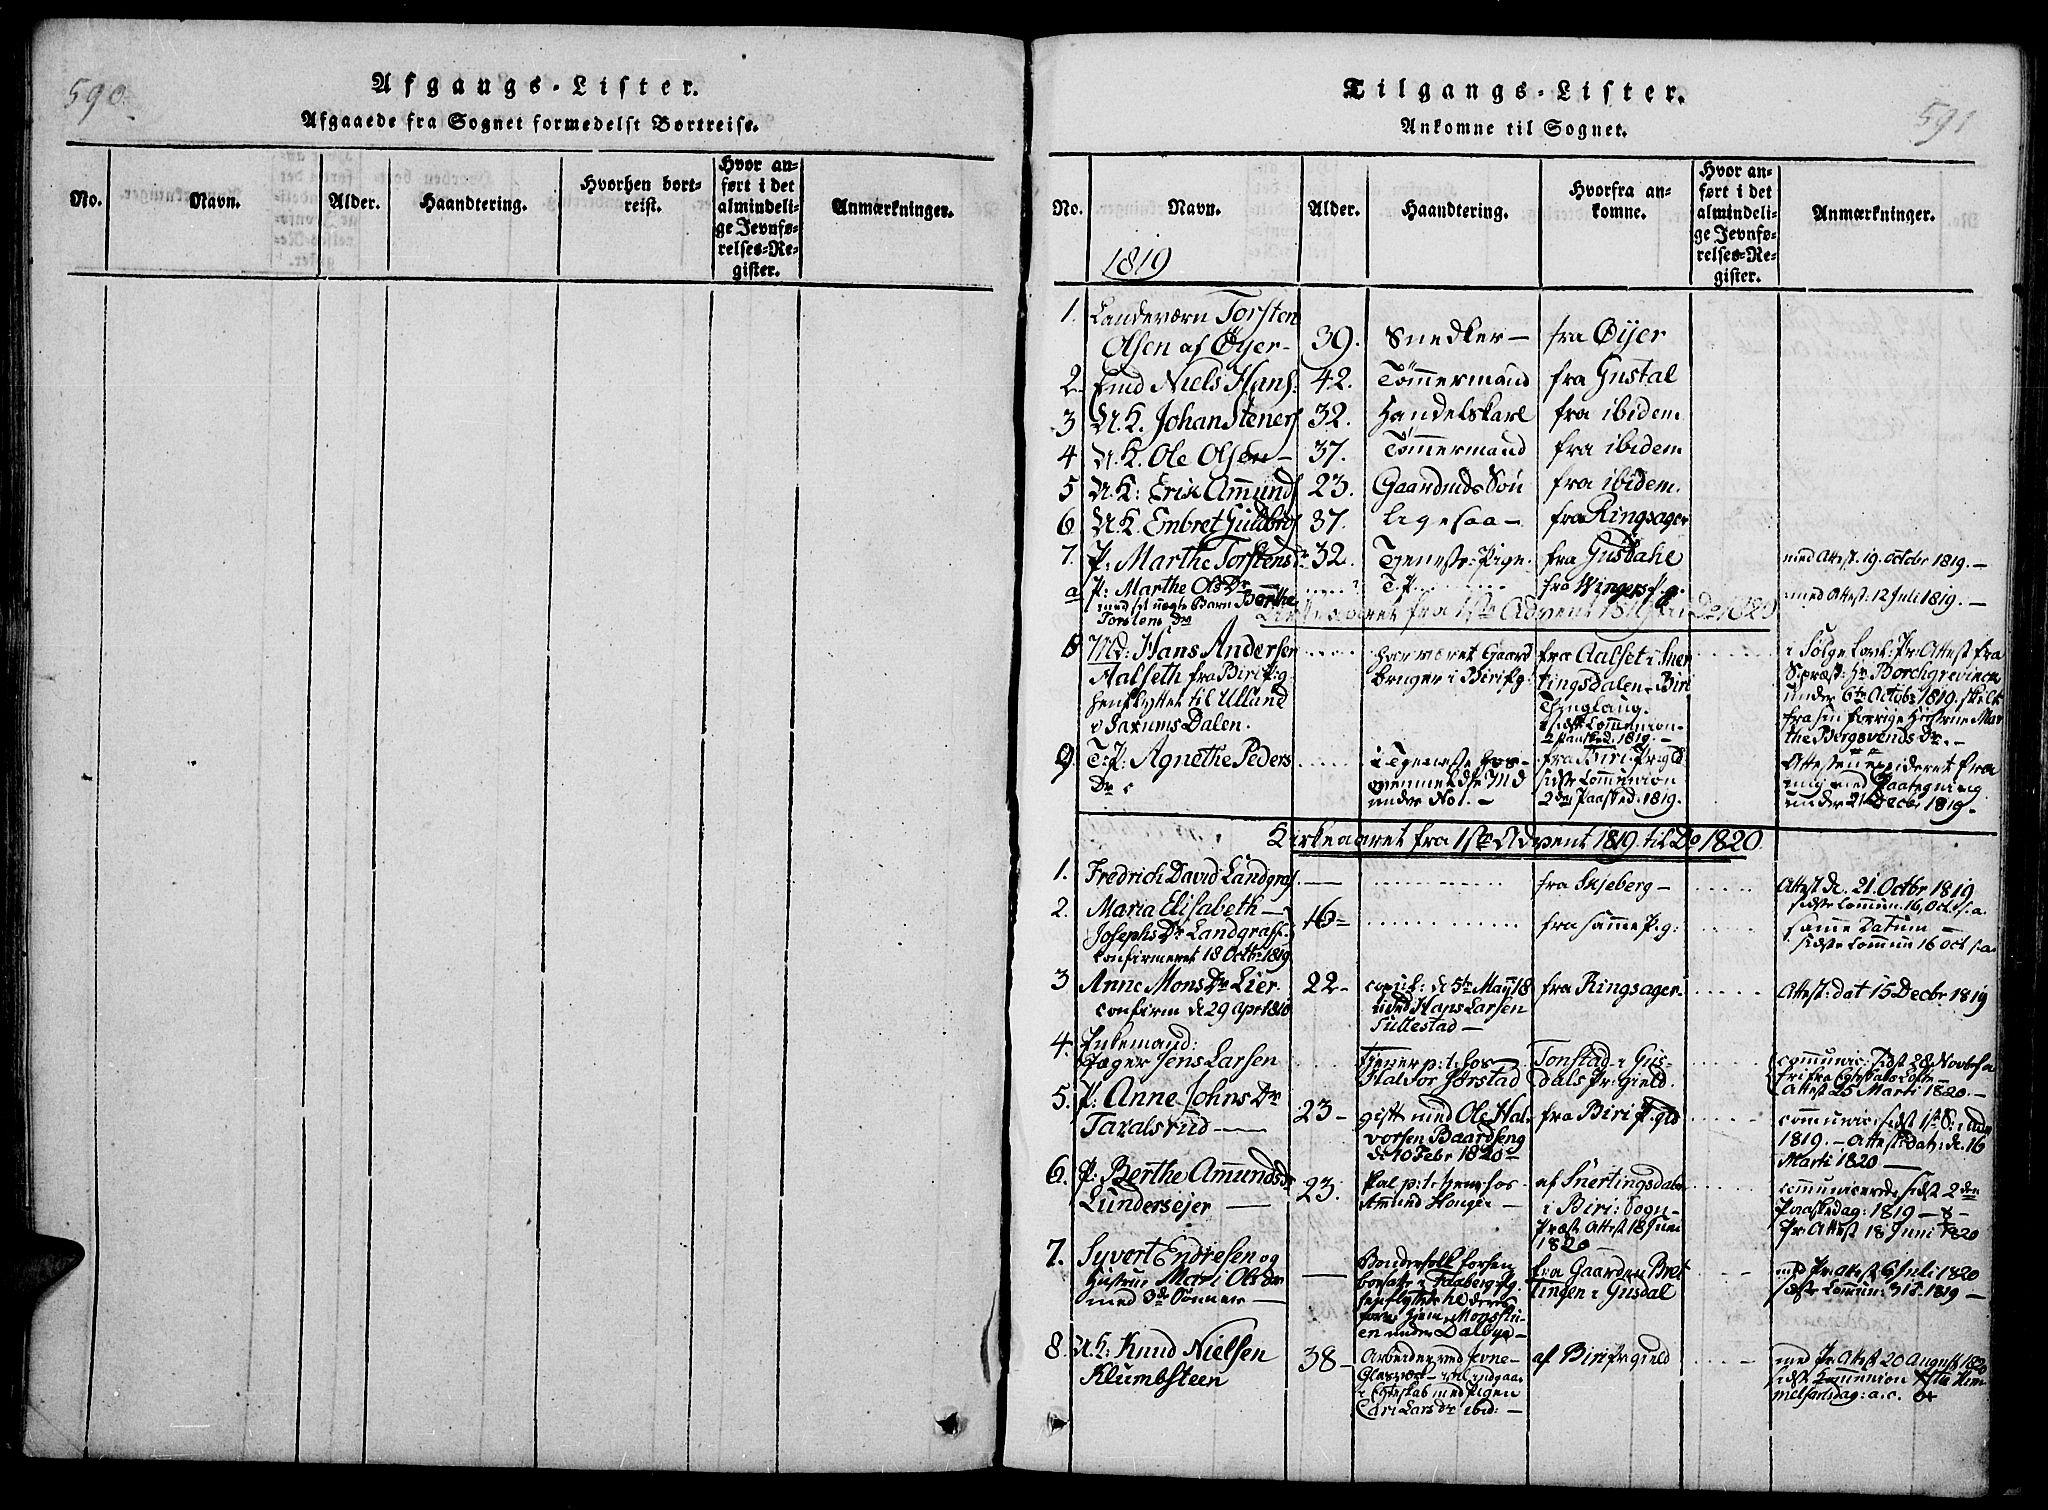 SAH, Fåberg prestekontor, Ministerialbok nr. 3, 1818-1833, s. 590-591